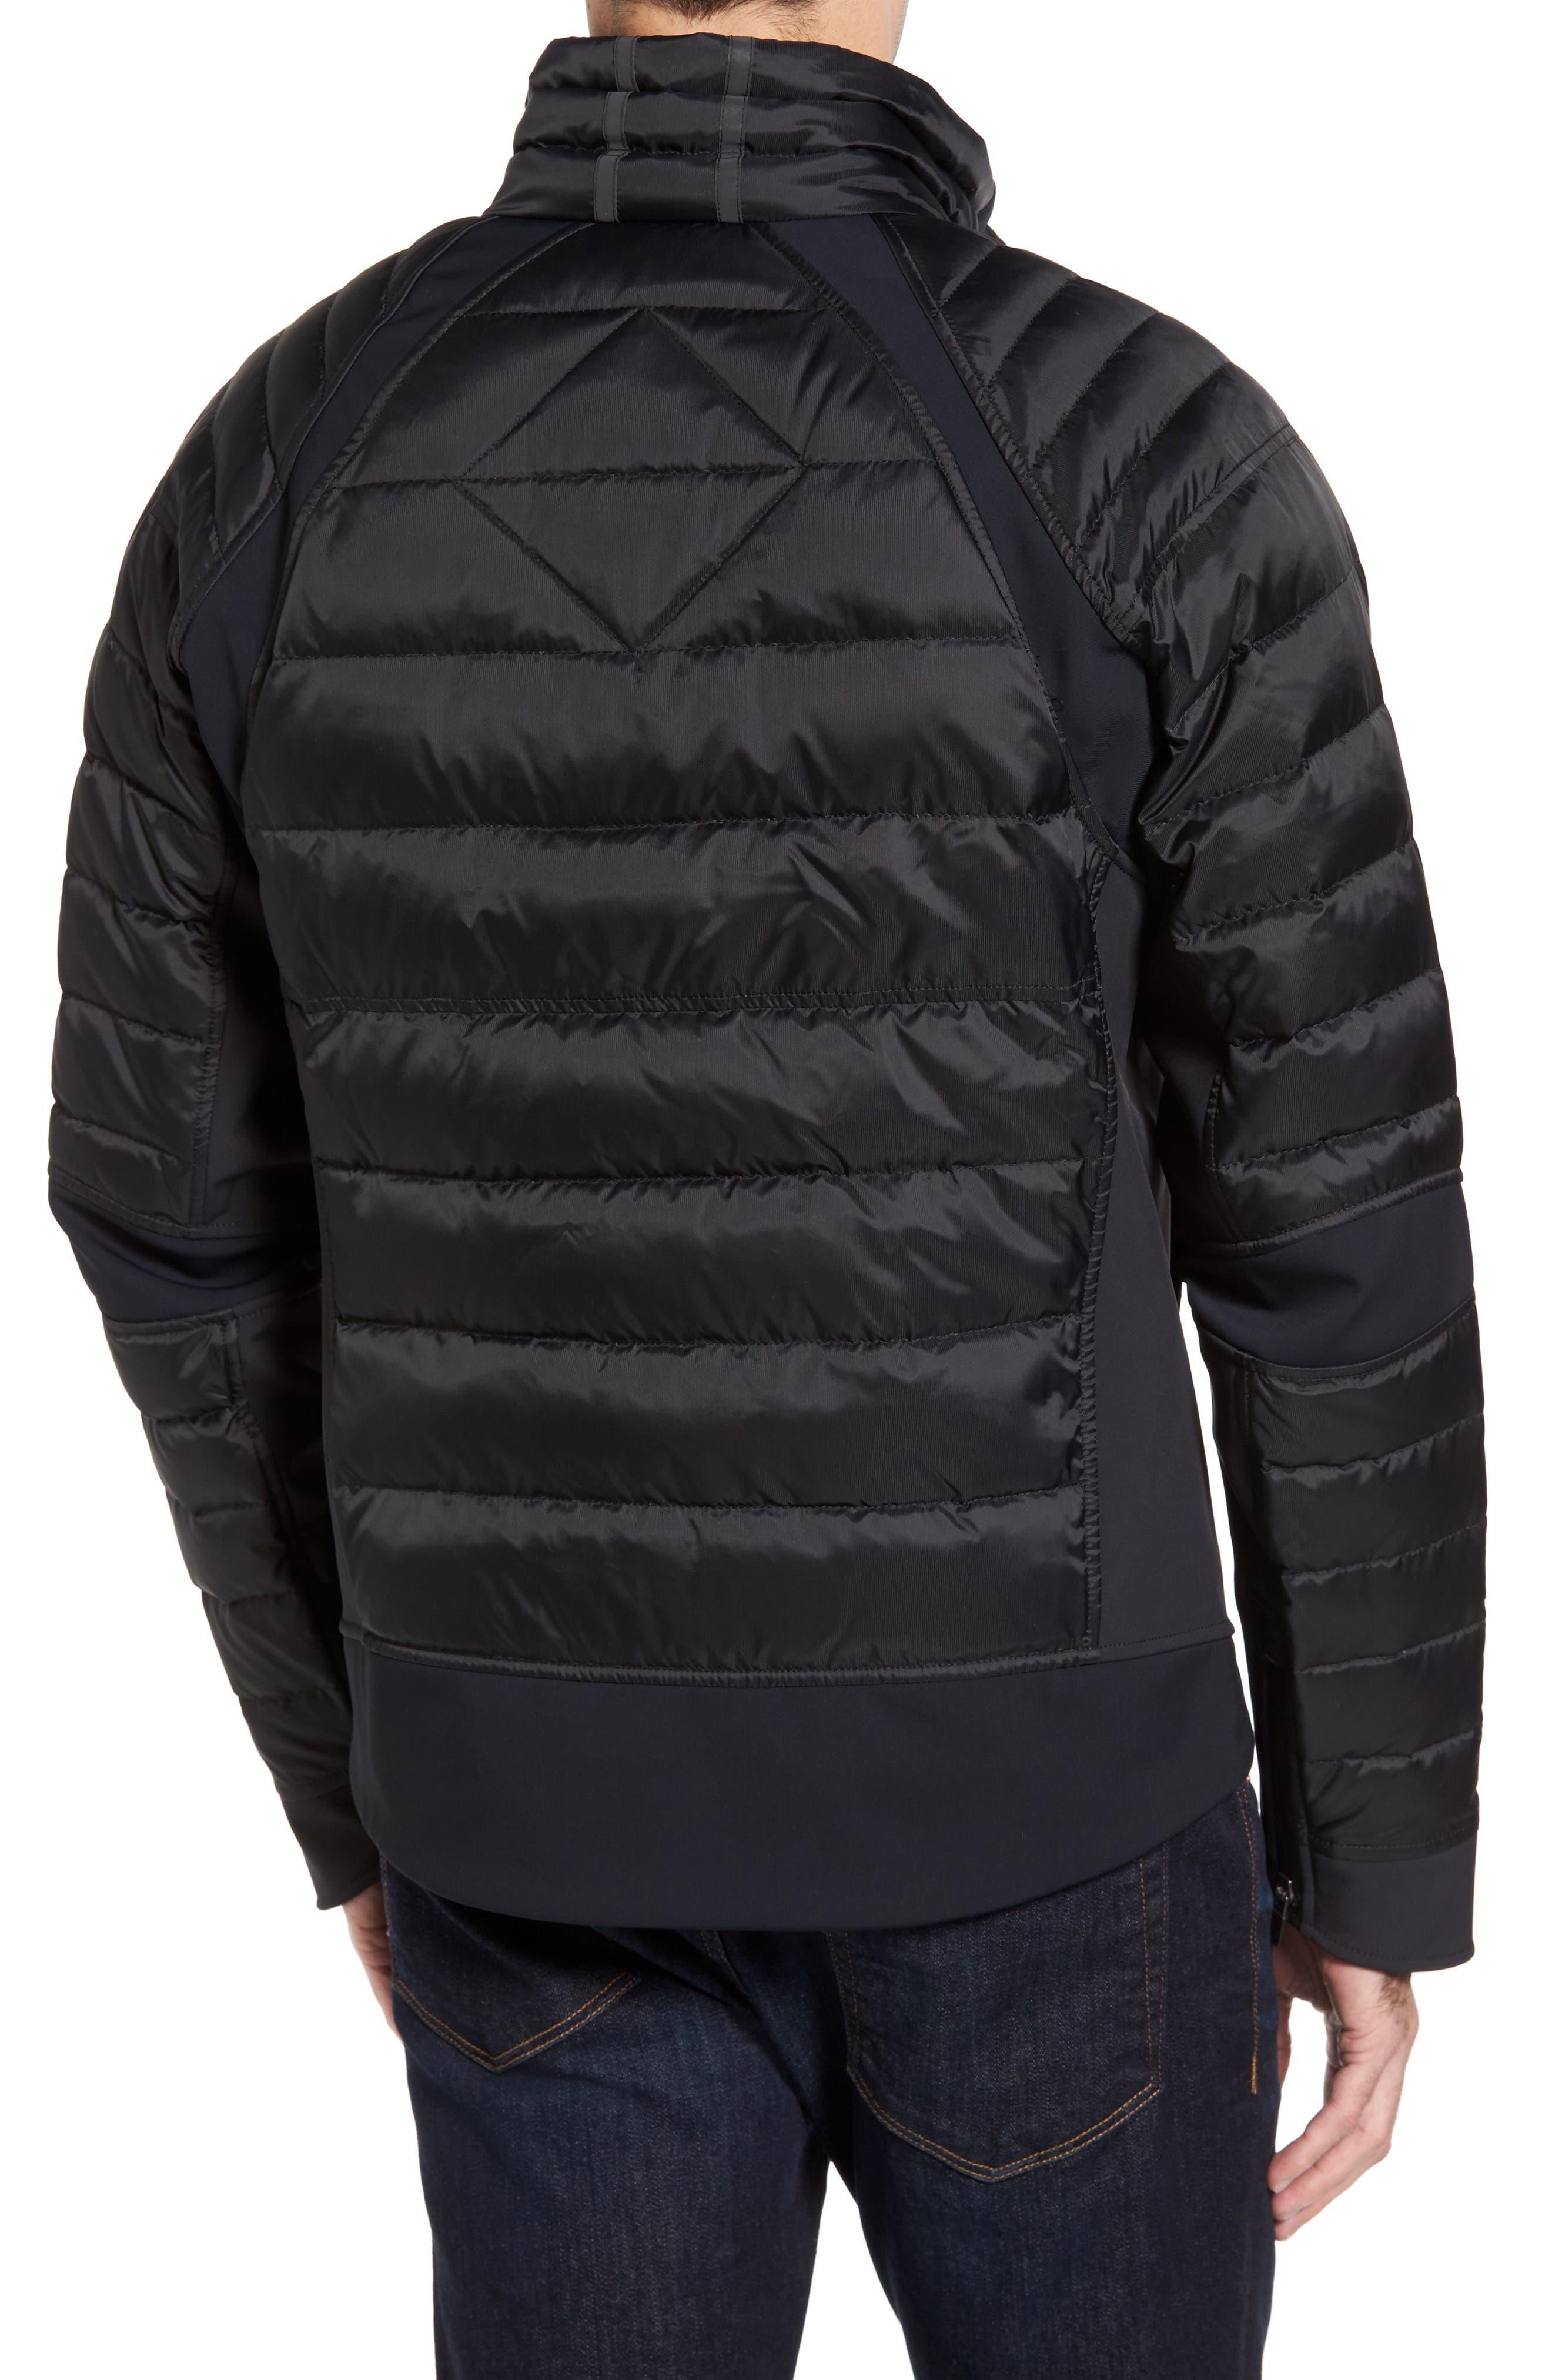 HyBridge Perren  Slim Fit Packable Down Jacket,                             Alternate thumbnail 2, color,                             BLACK